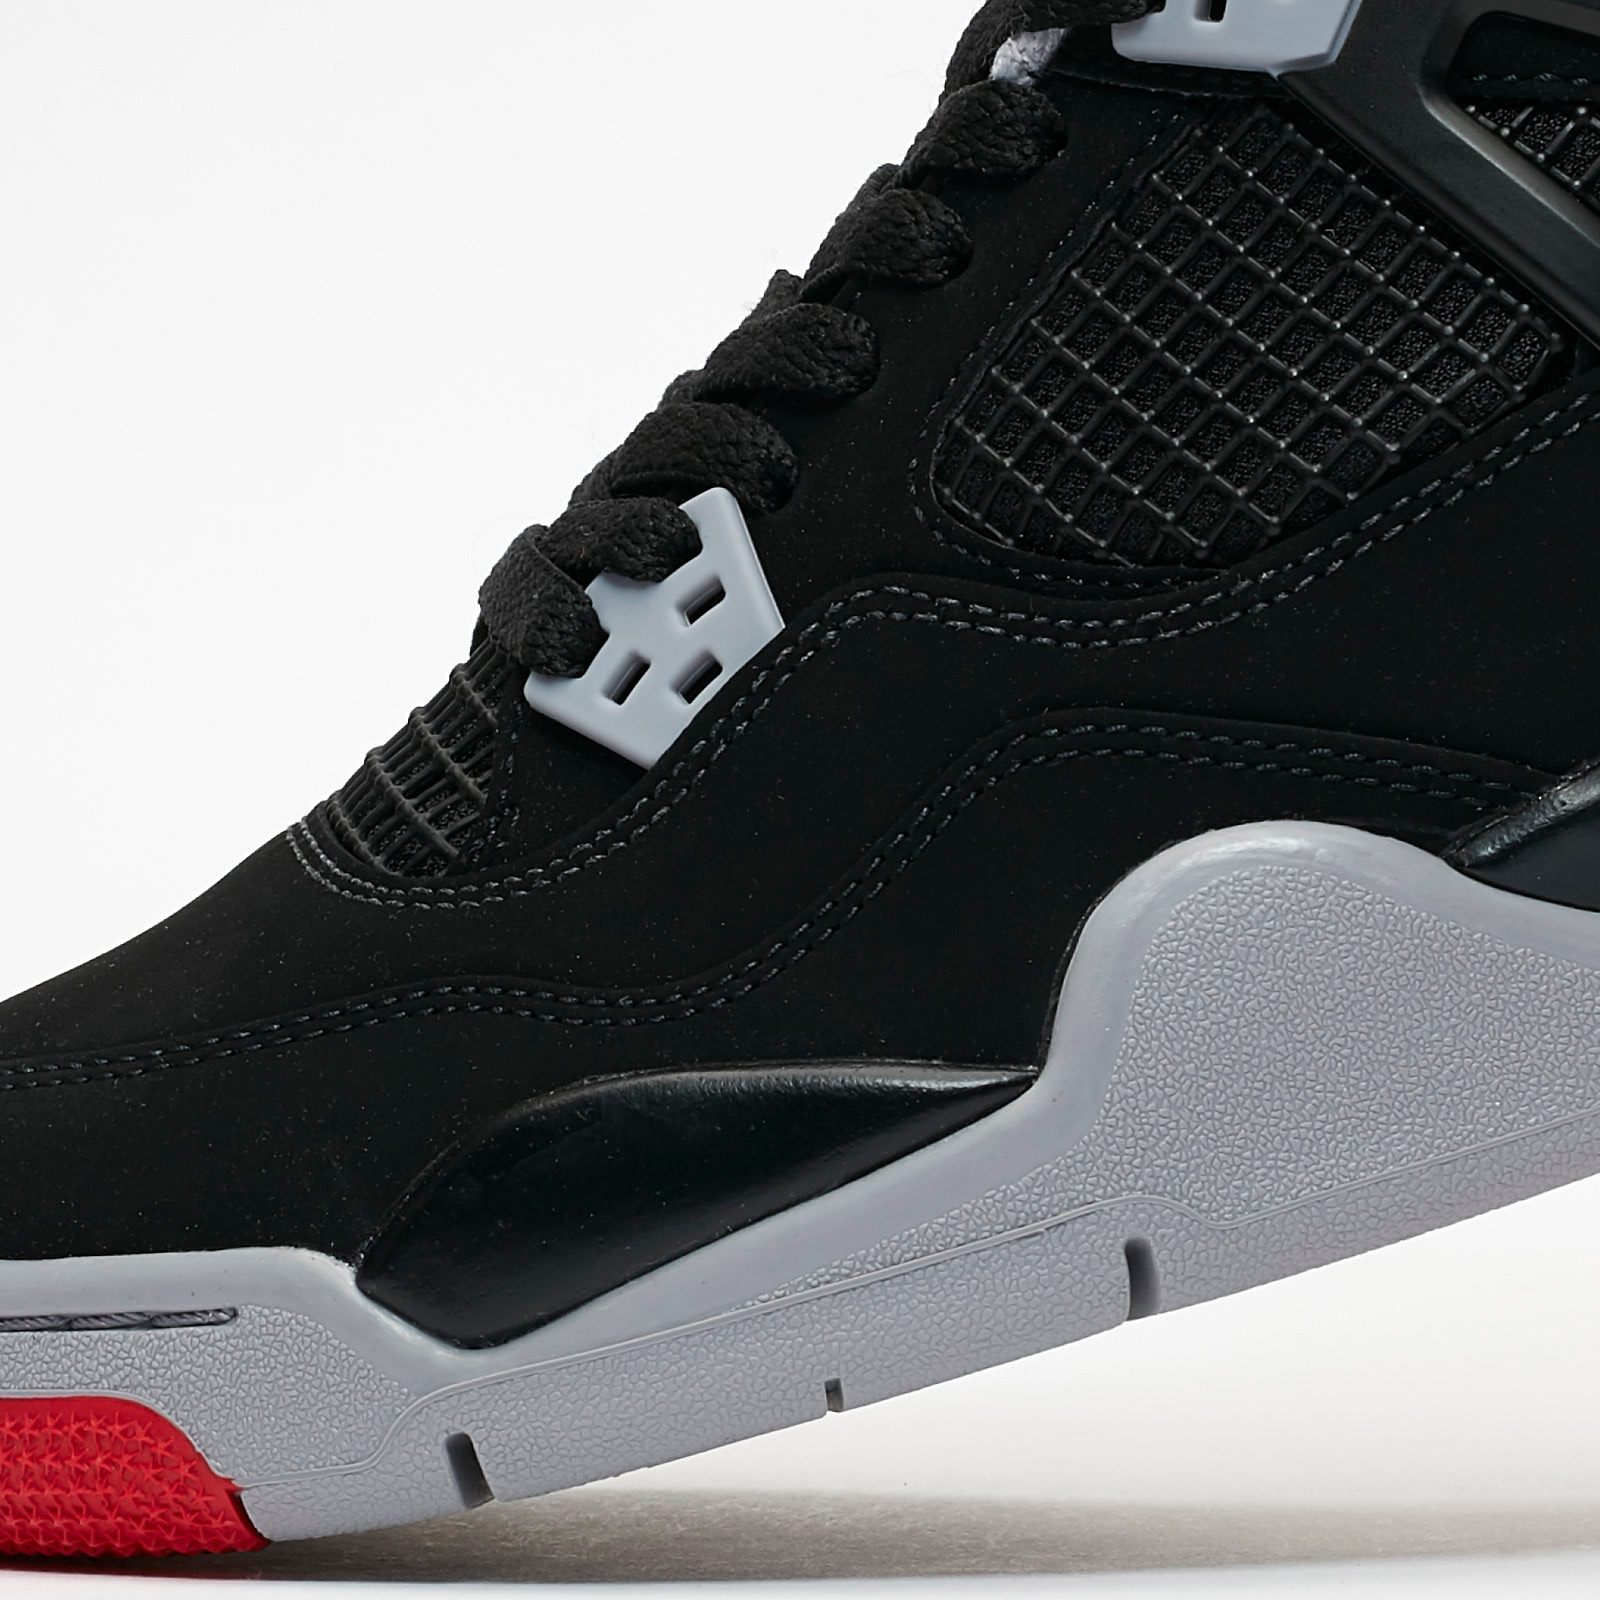 size 40 d62c0 26a10 Jordan Brand Air Jordan 4 Retro (GS) - 7. Close